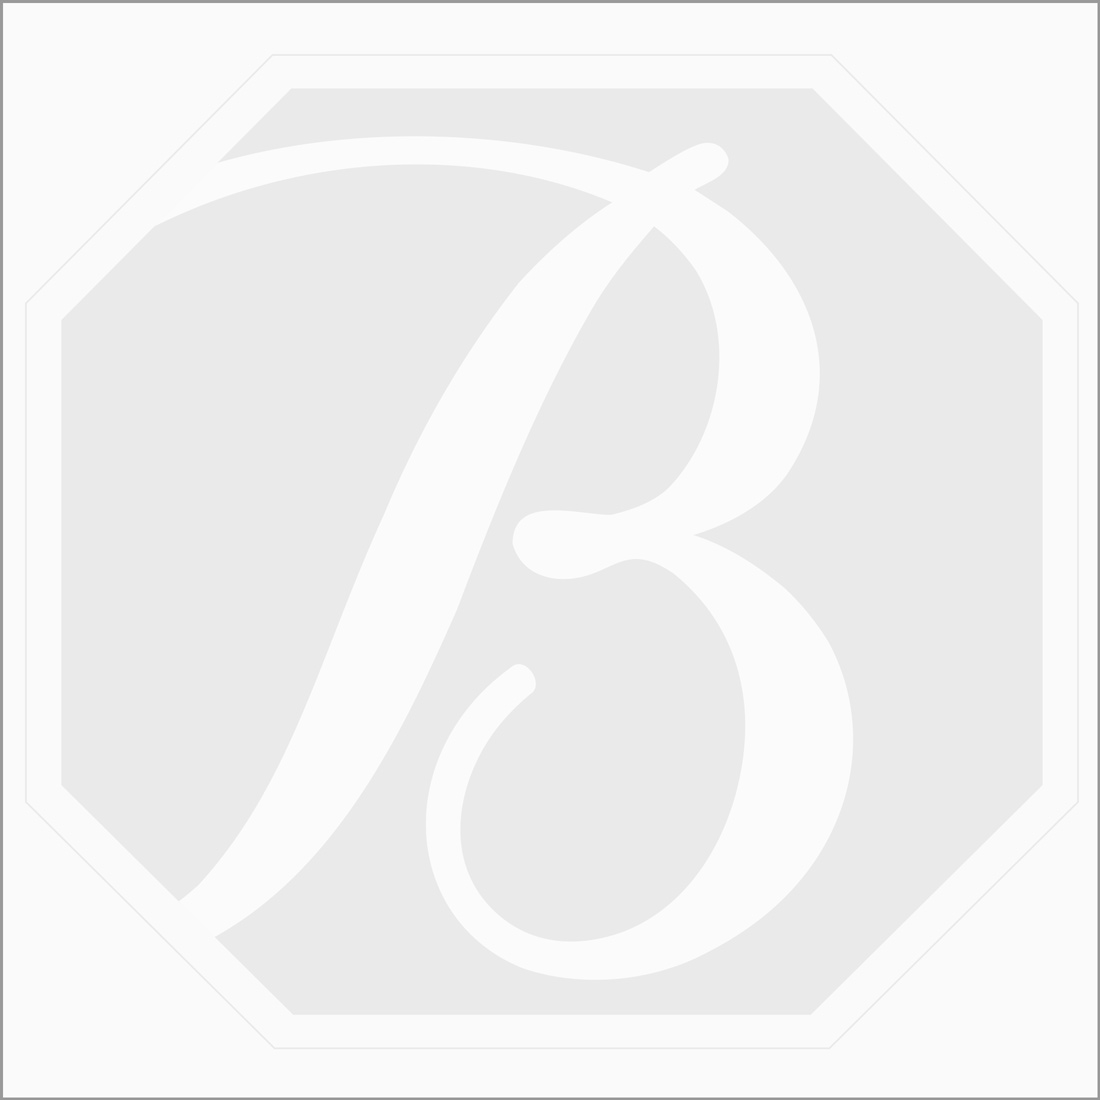 8 to 9 mm - Tourmaline Drop Earrings - 39.61 carats (CSEarr1041)